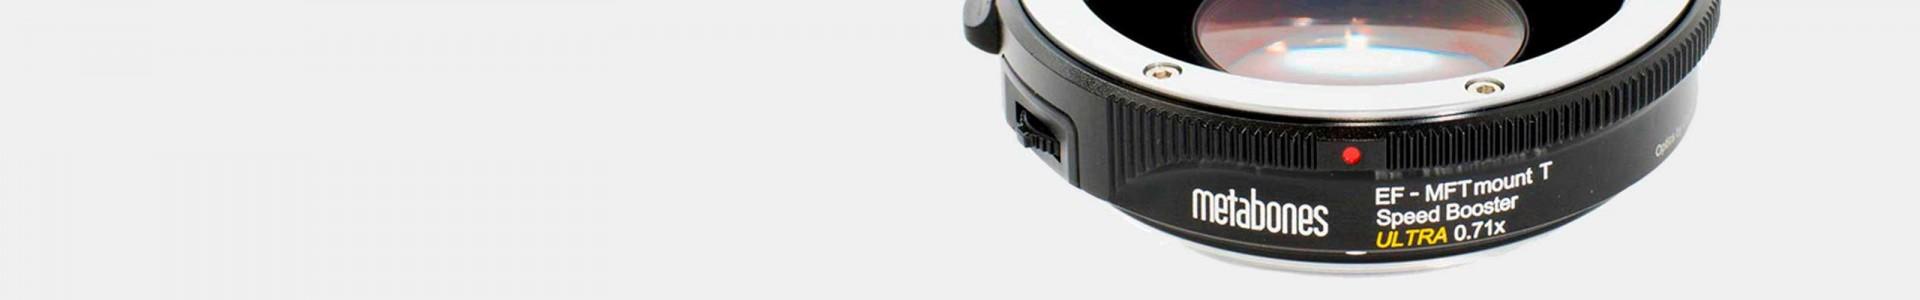 Metabones optical adapters at Avacab - Best online price